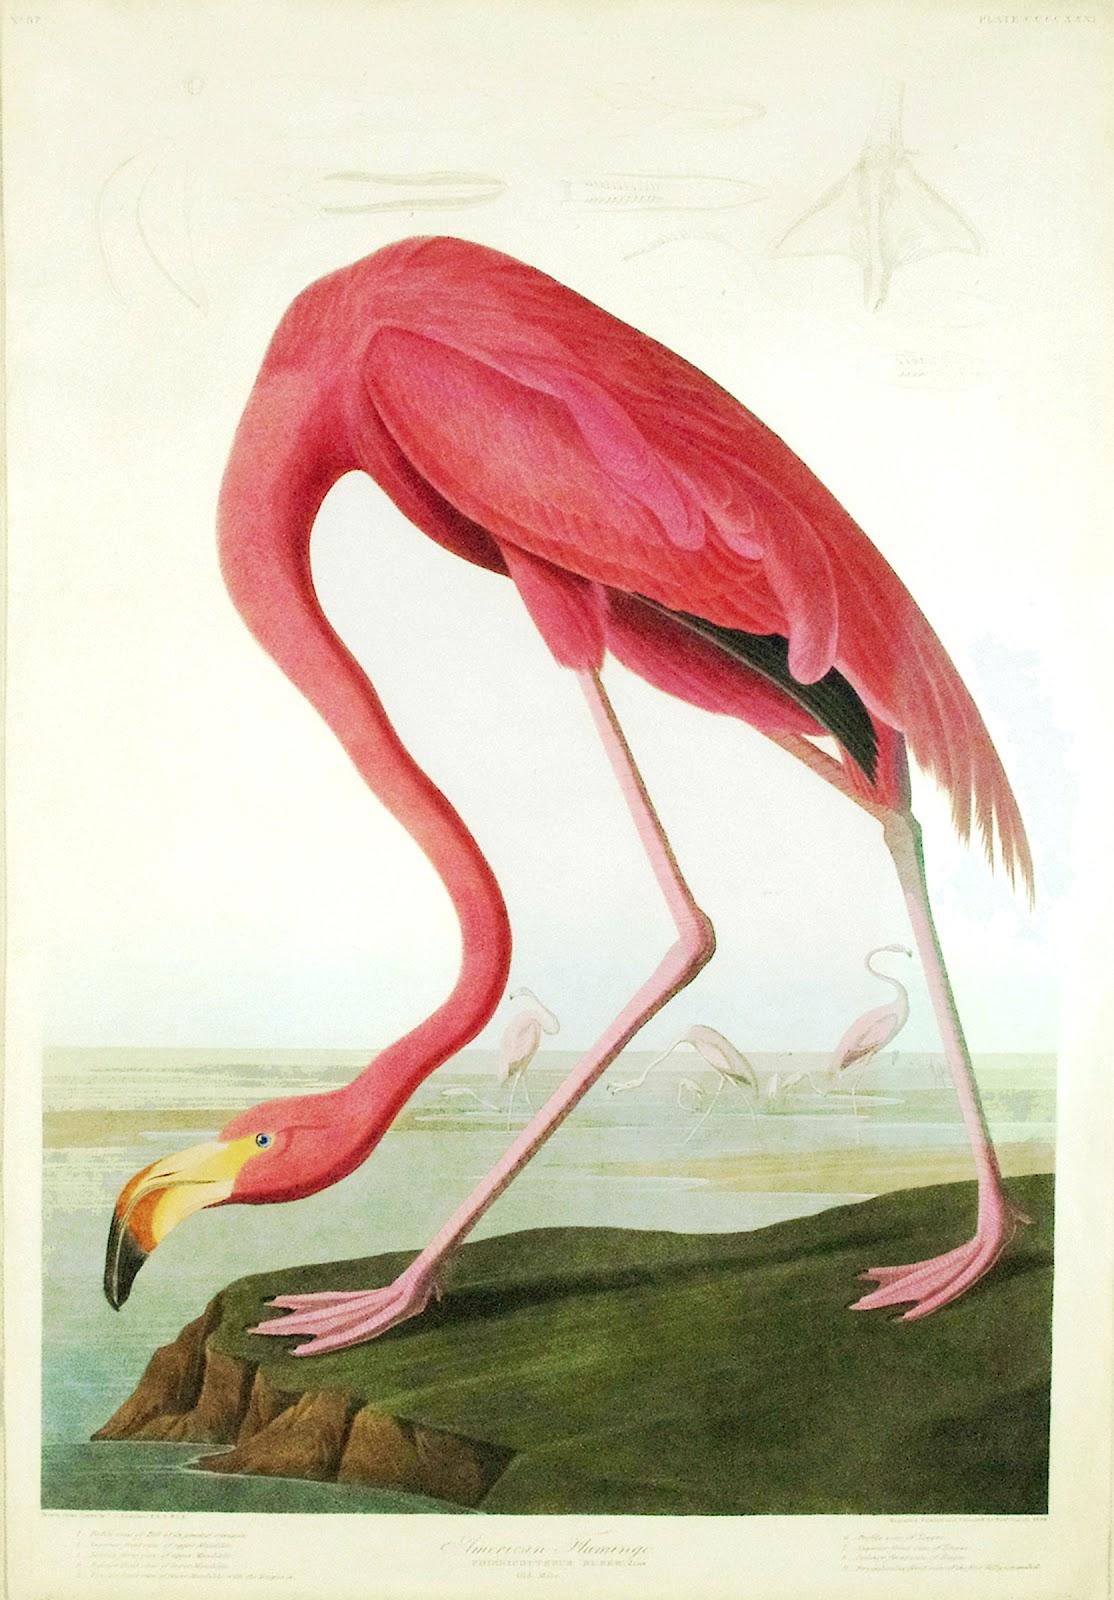 Graham Arader Audubon 39 S Monumental Testaments To American